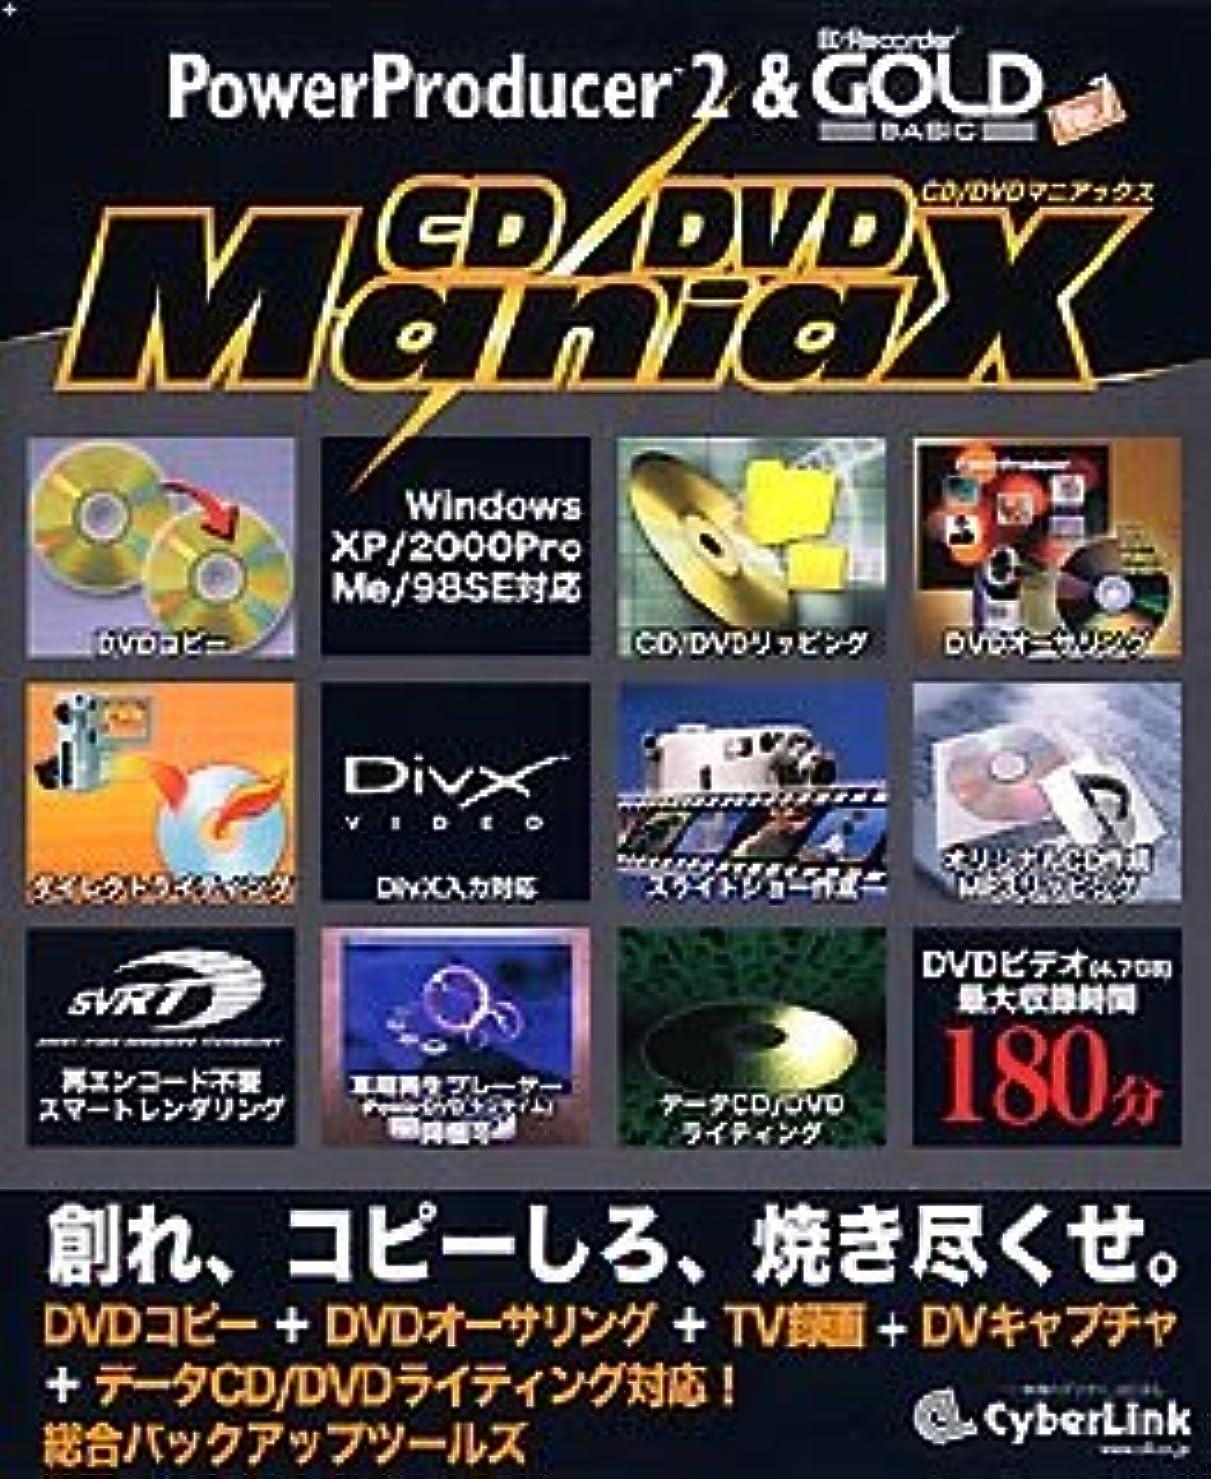 種類入口政治PowerProducer 2 & B's Recorder GOLD BASIC Ver.7 CD/DVD ManiaX